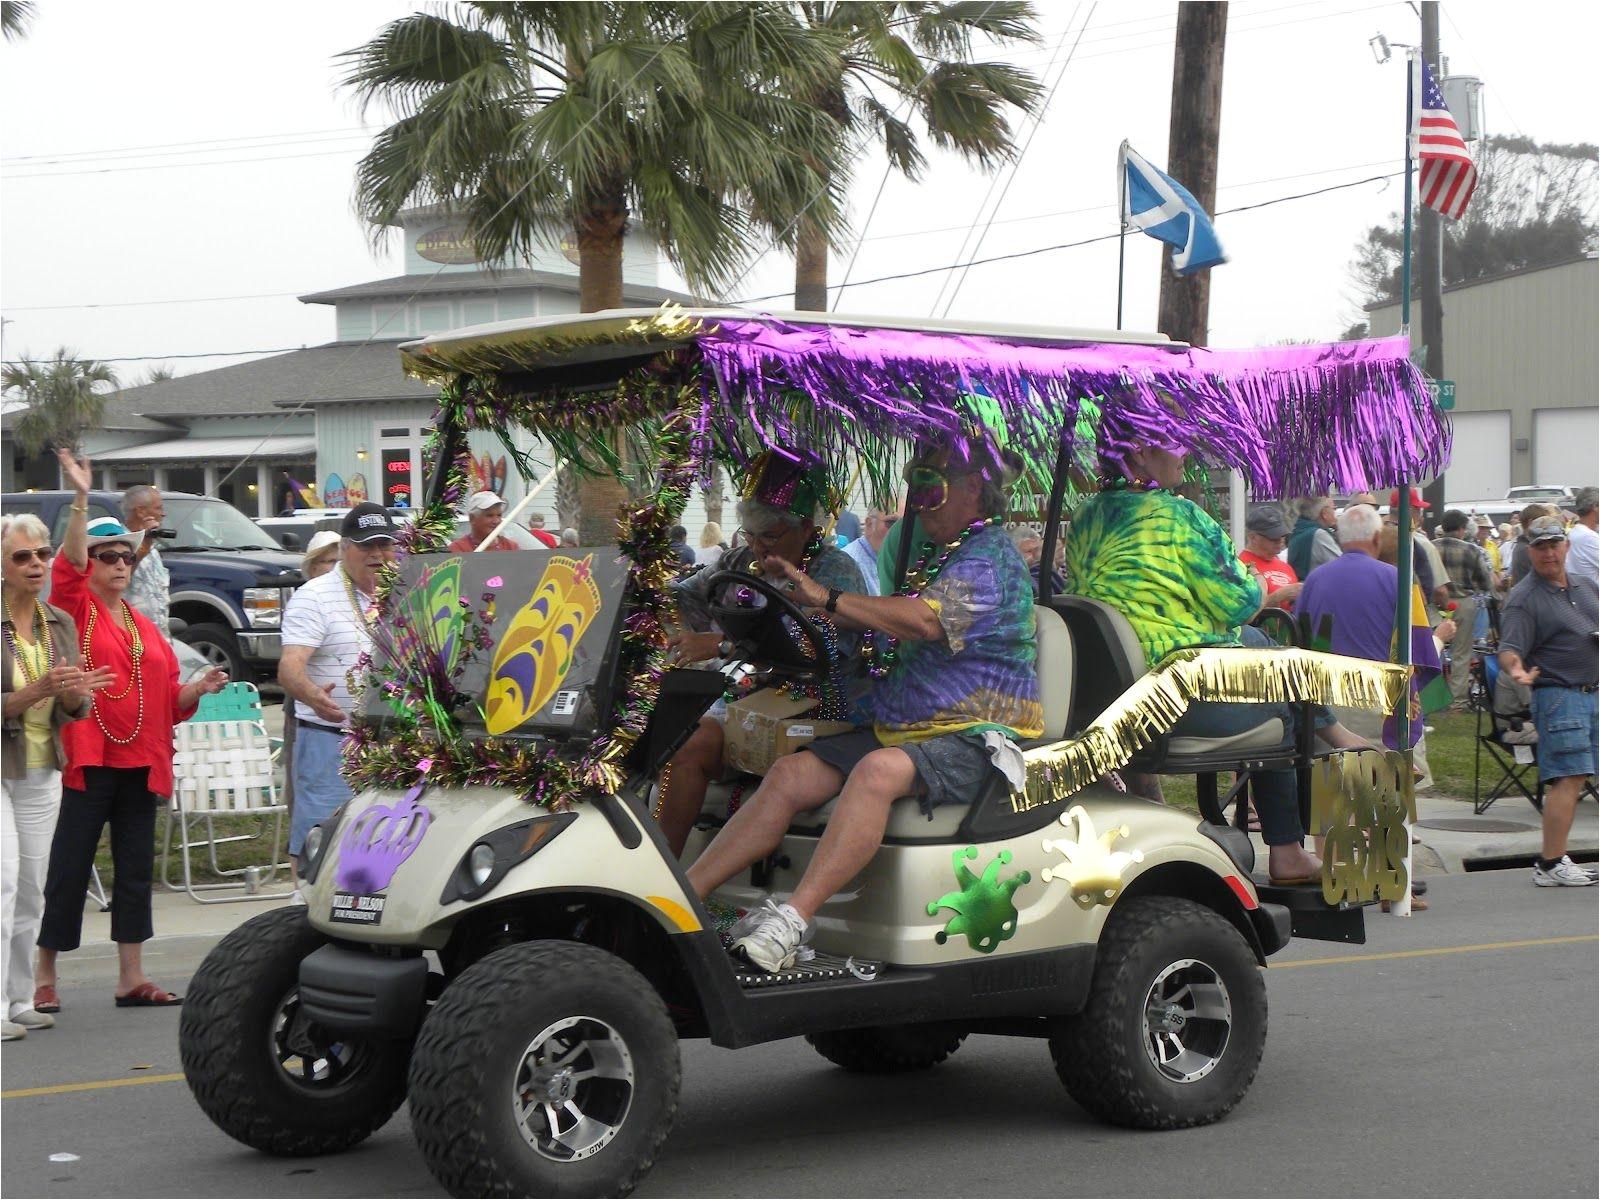 Golf Cart Christmas Decorations.Decorated Golf Cart For Christmas Parade Mardi Gras Golf